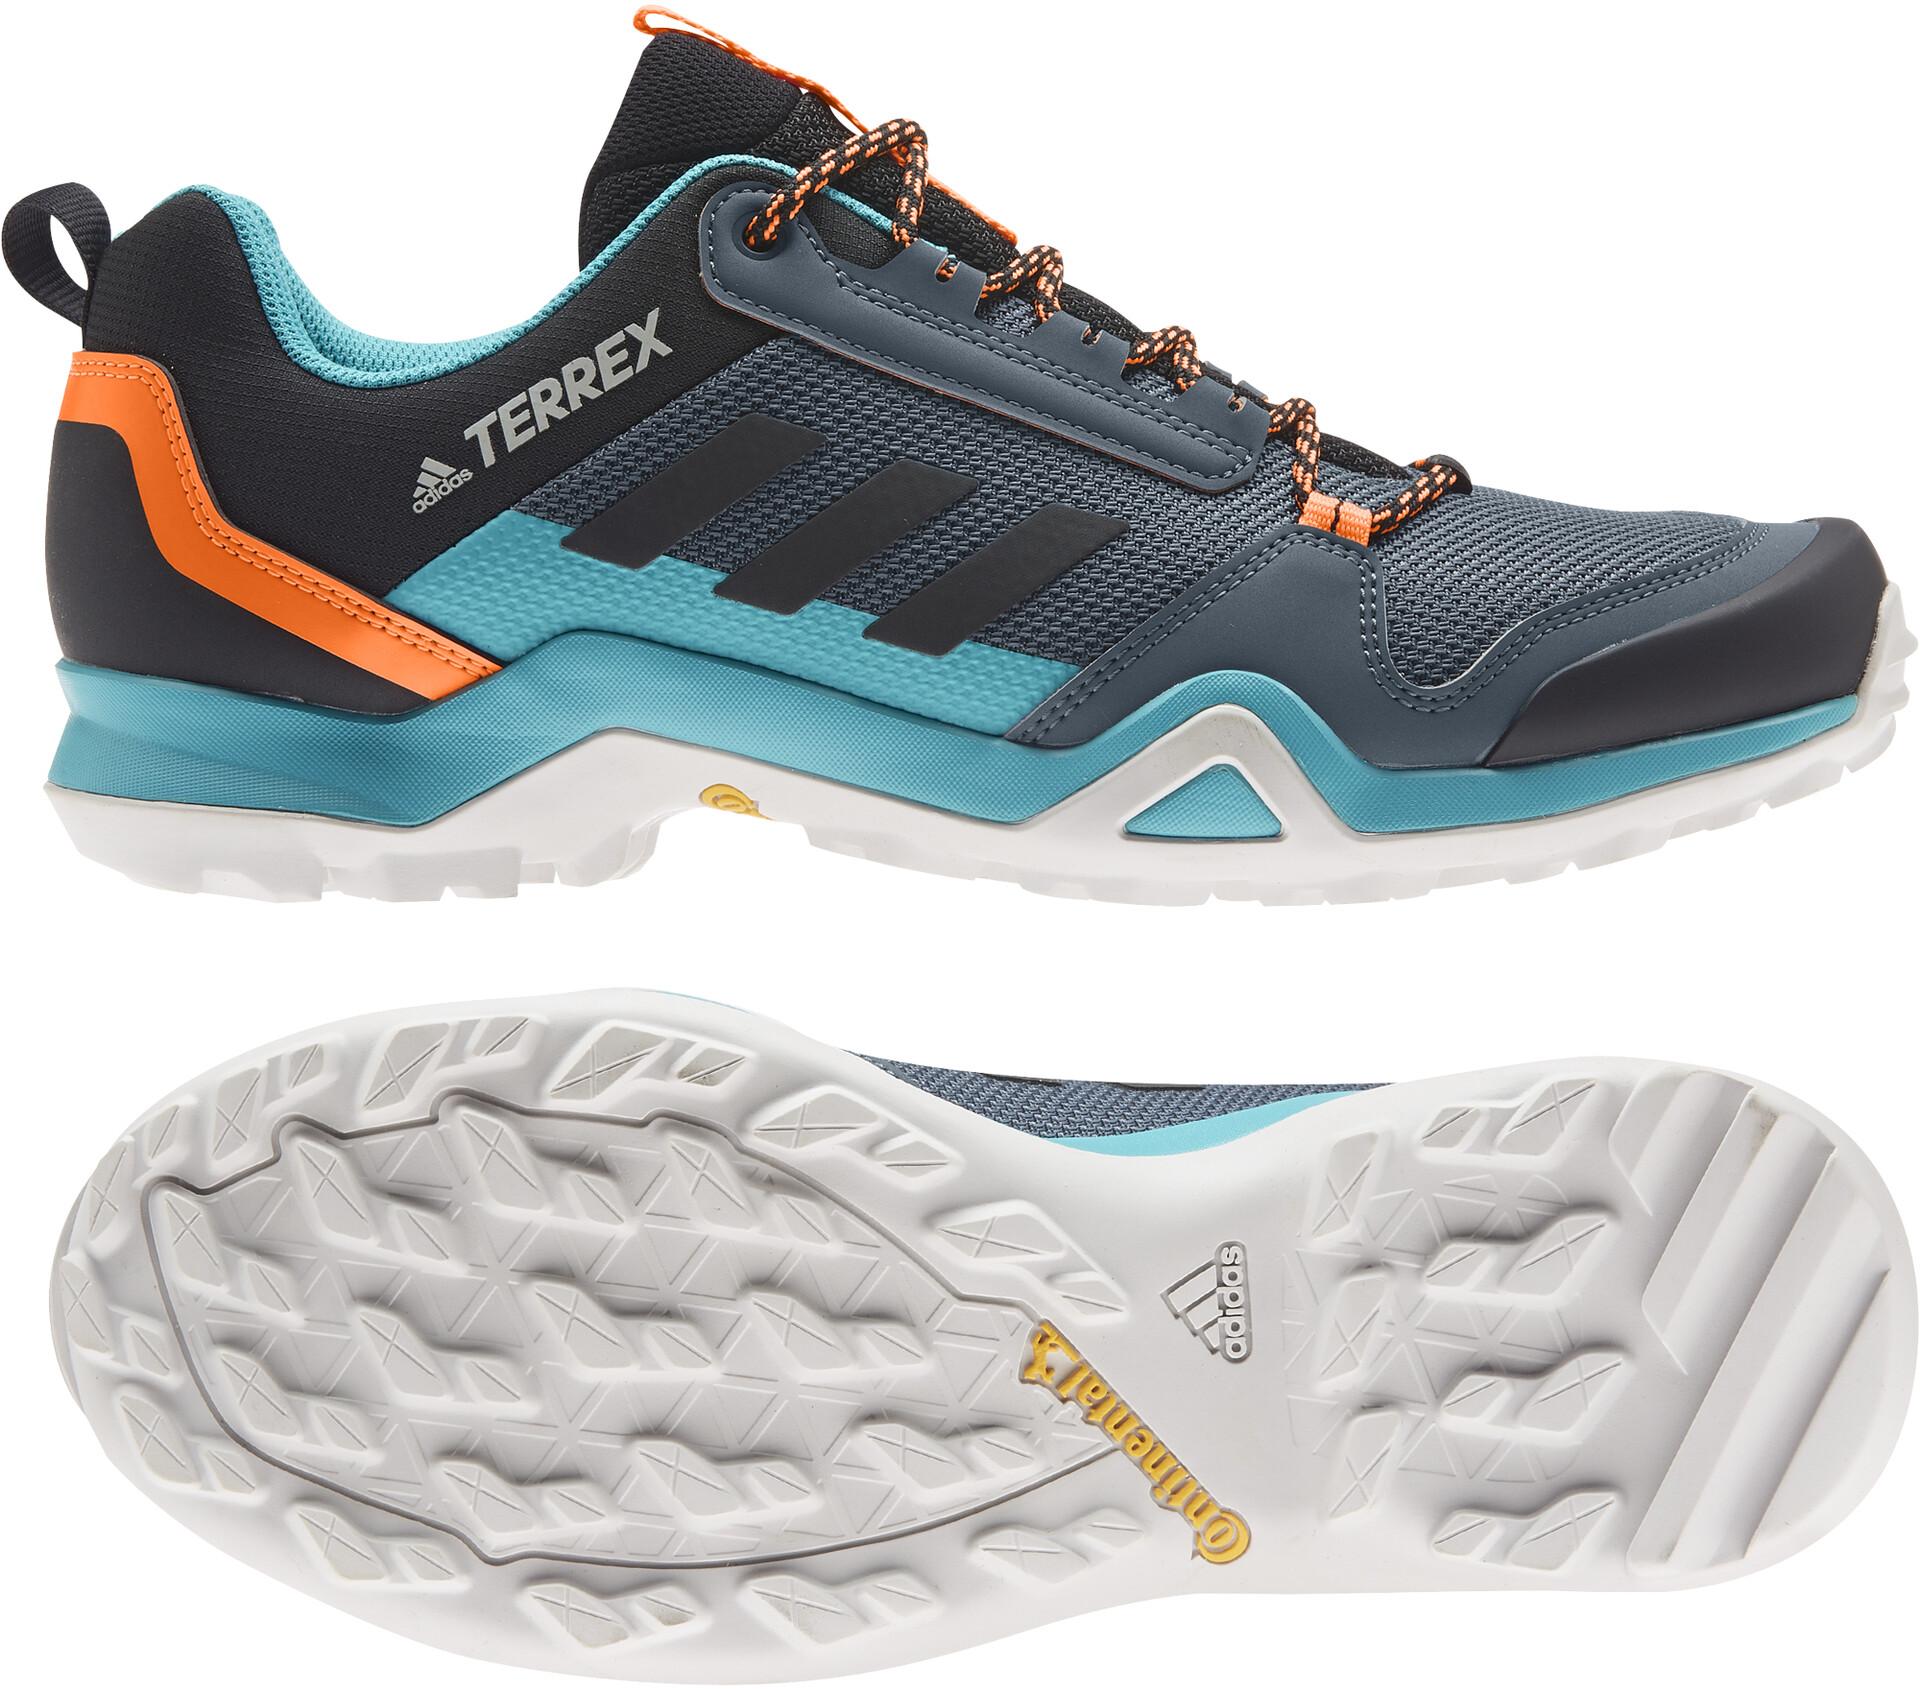 adidas TERREX AX3 Hiking Shoes Men